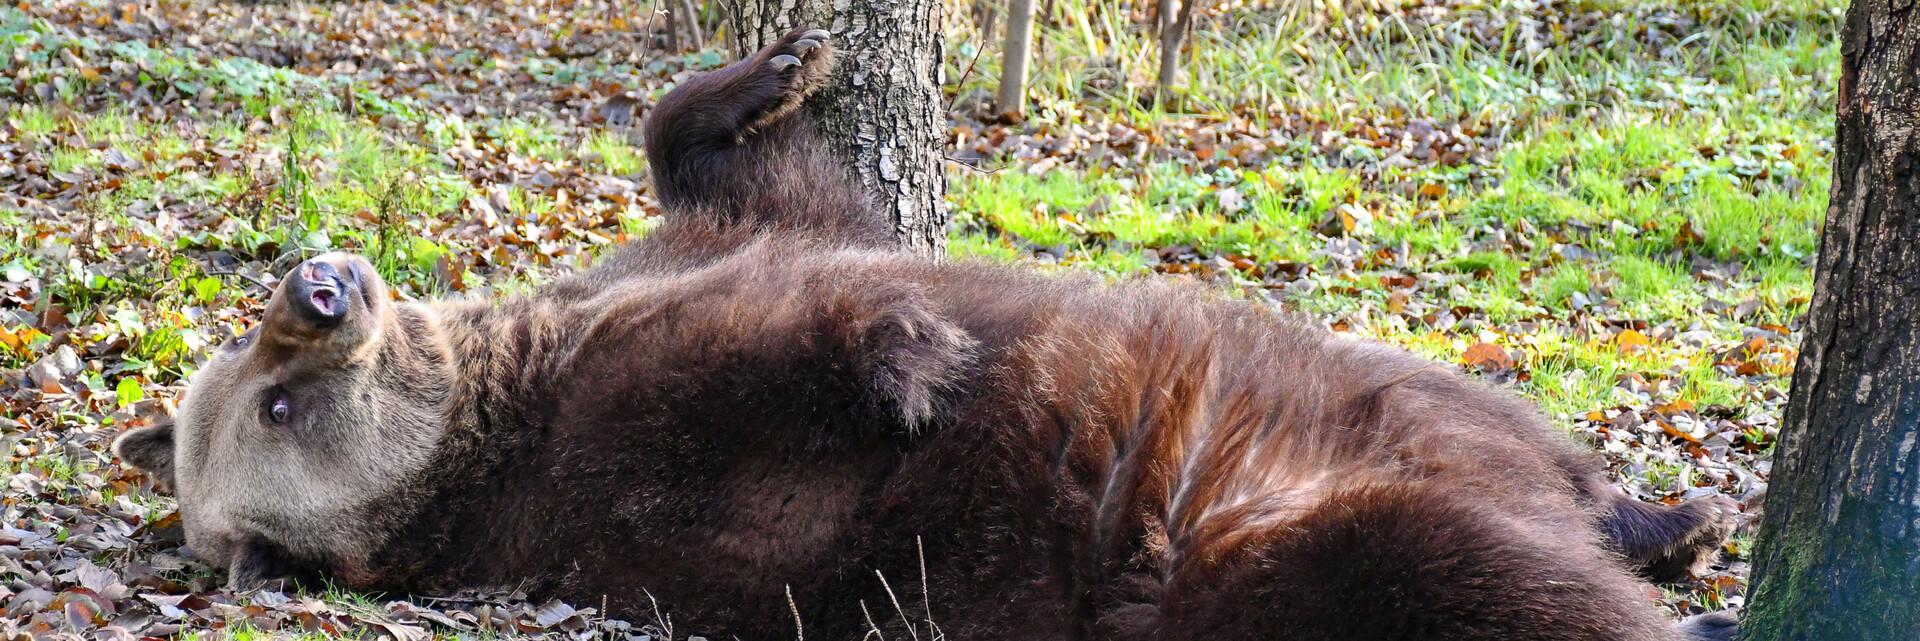 Bear at Müritz